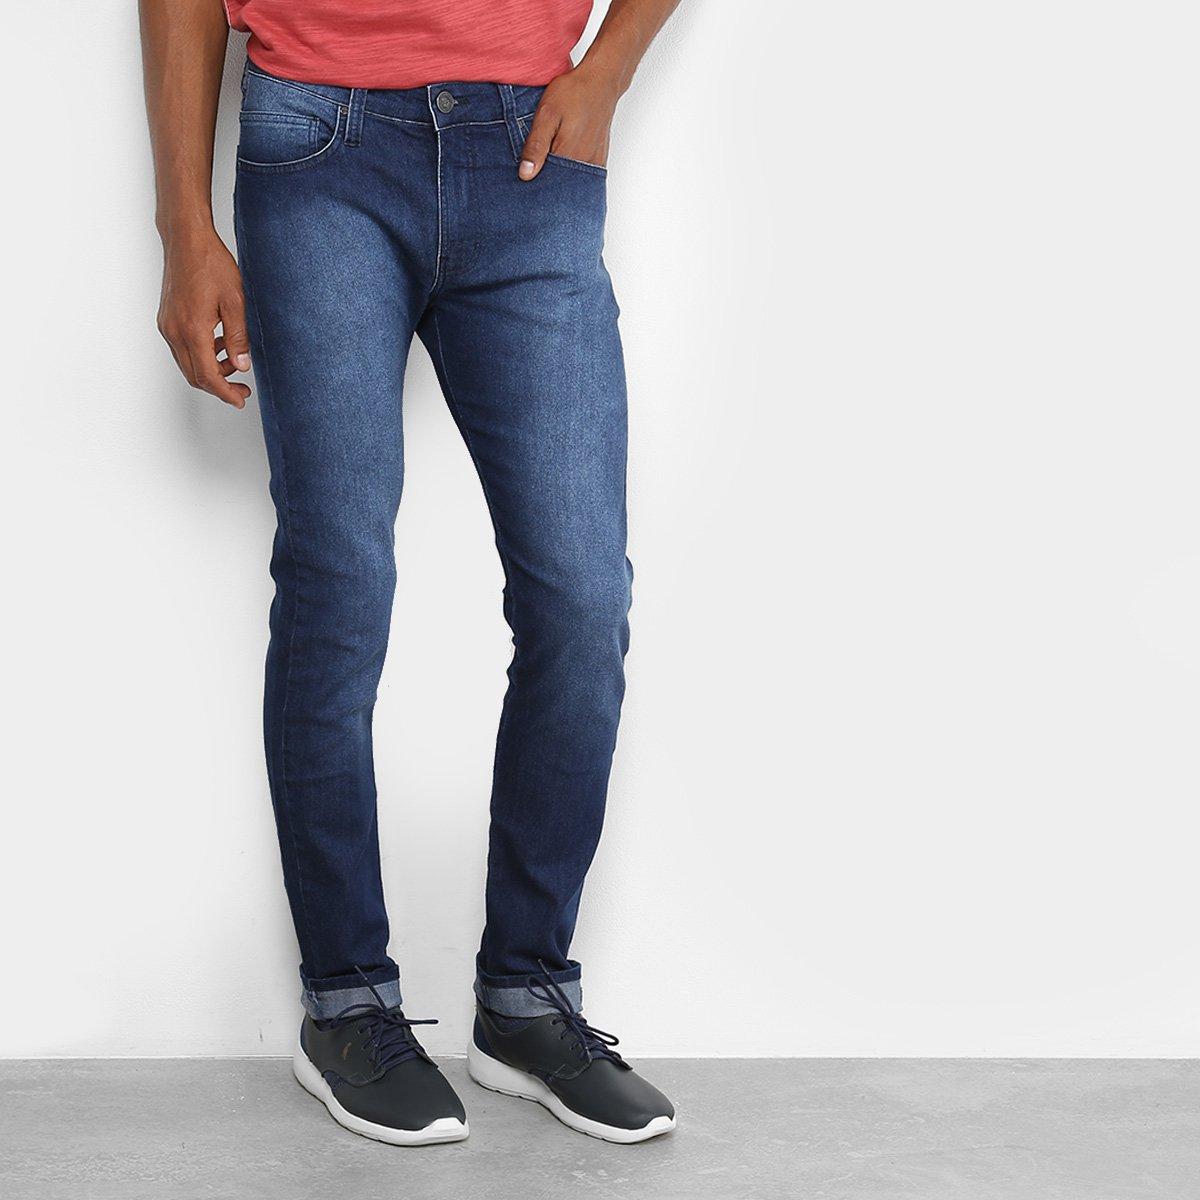 fb6270241 Calça Jeans Skinny Colcci Felipe Cintura Média Masculina